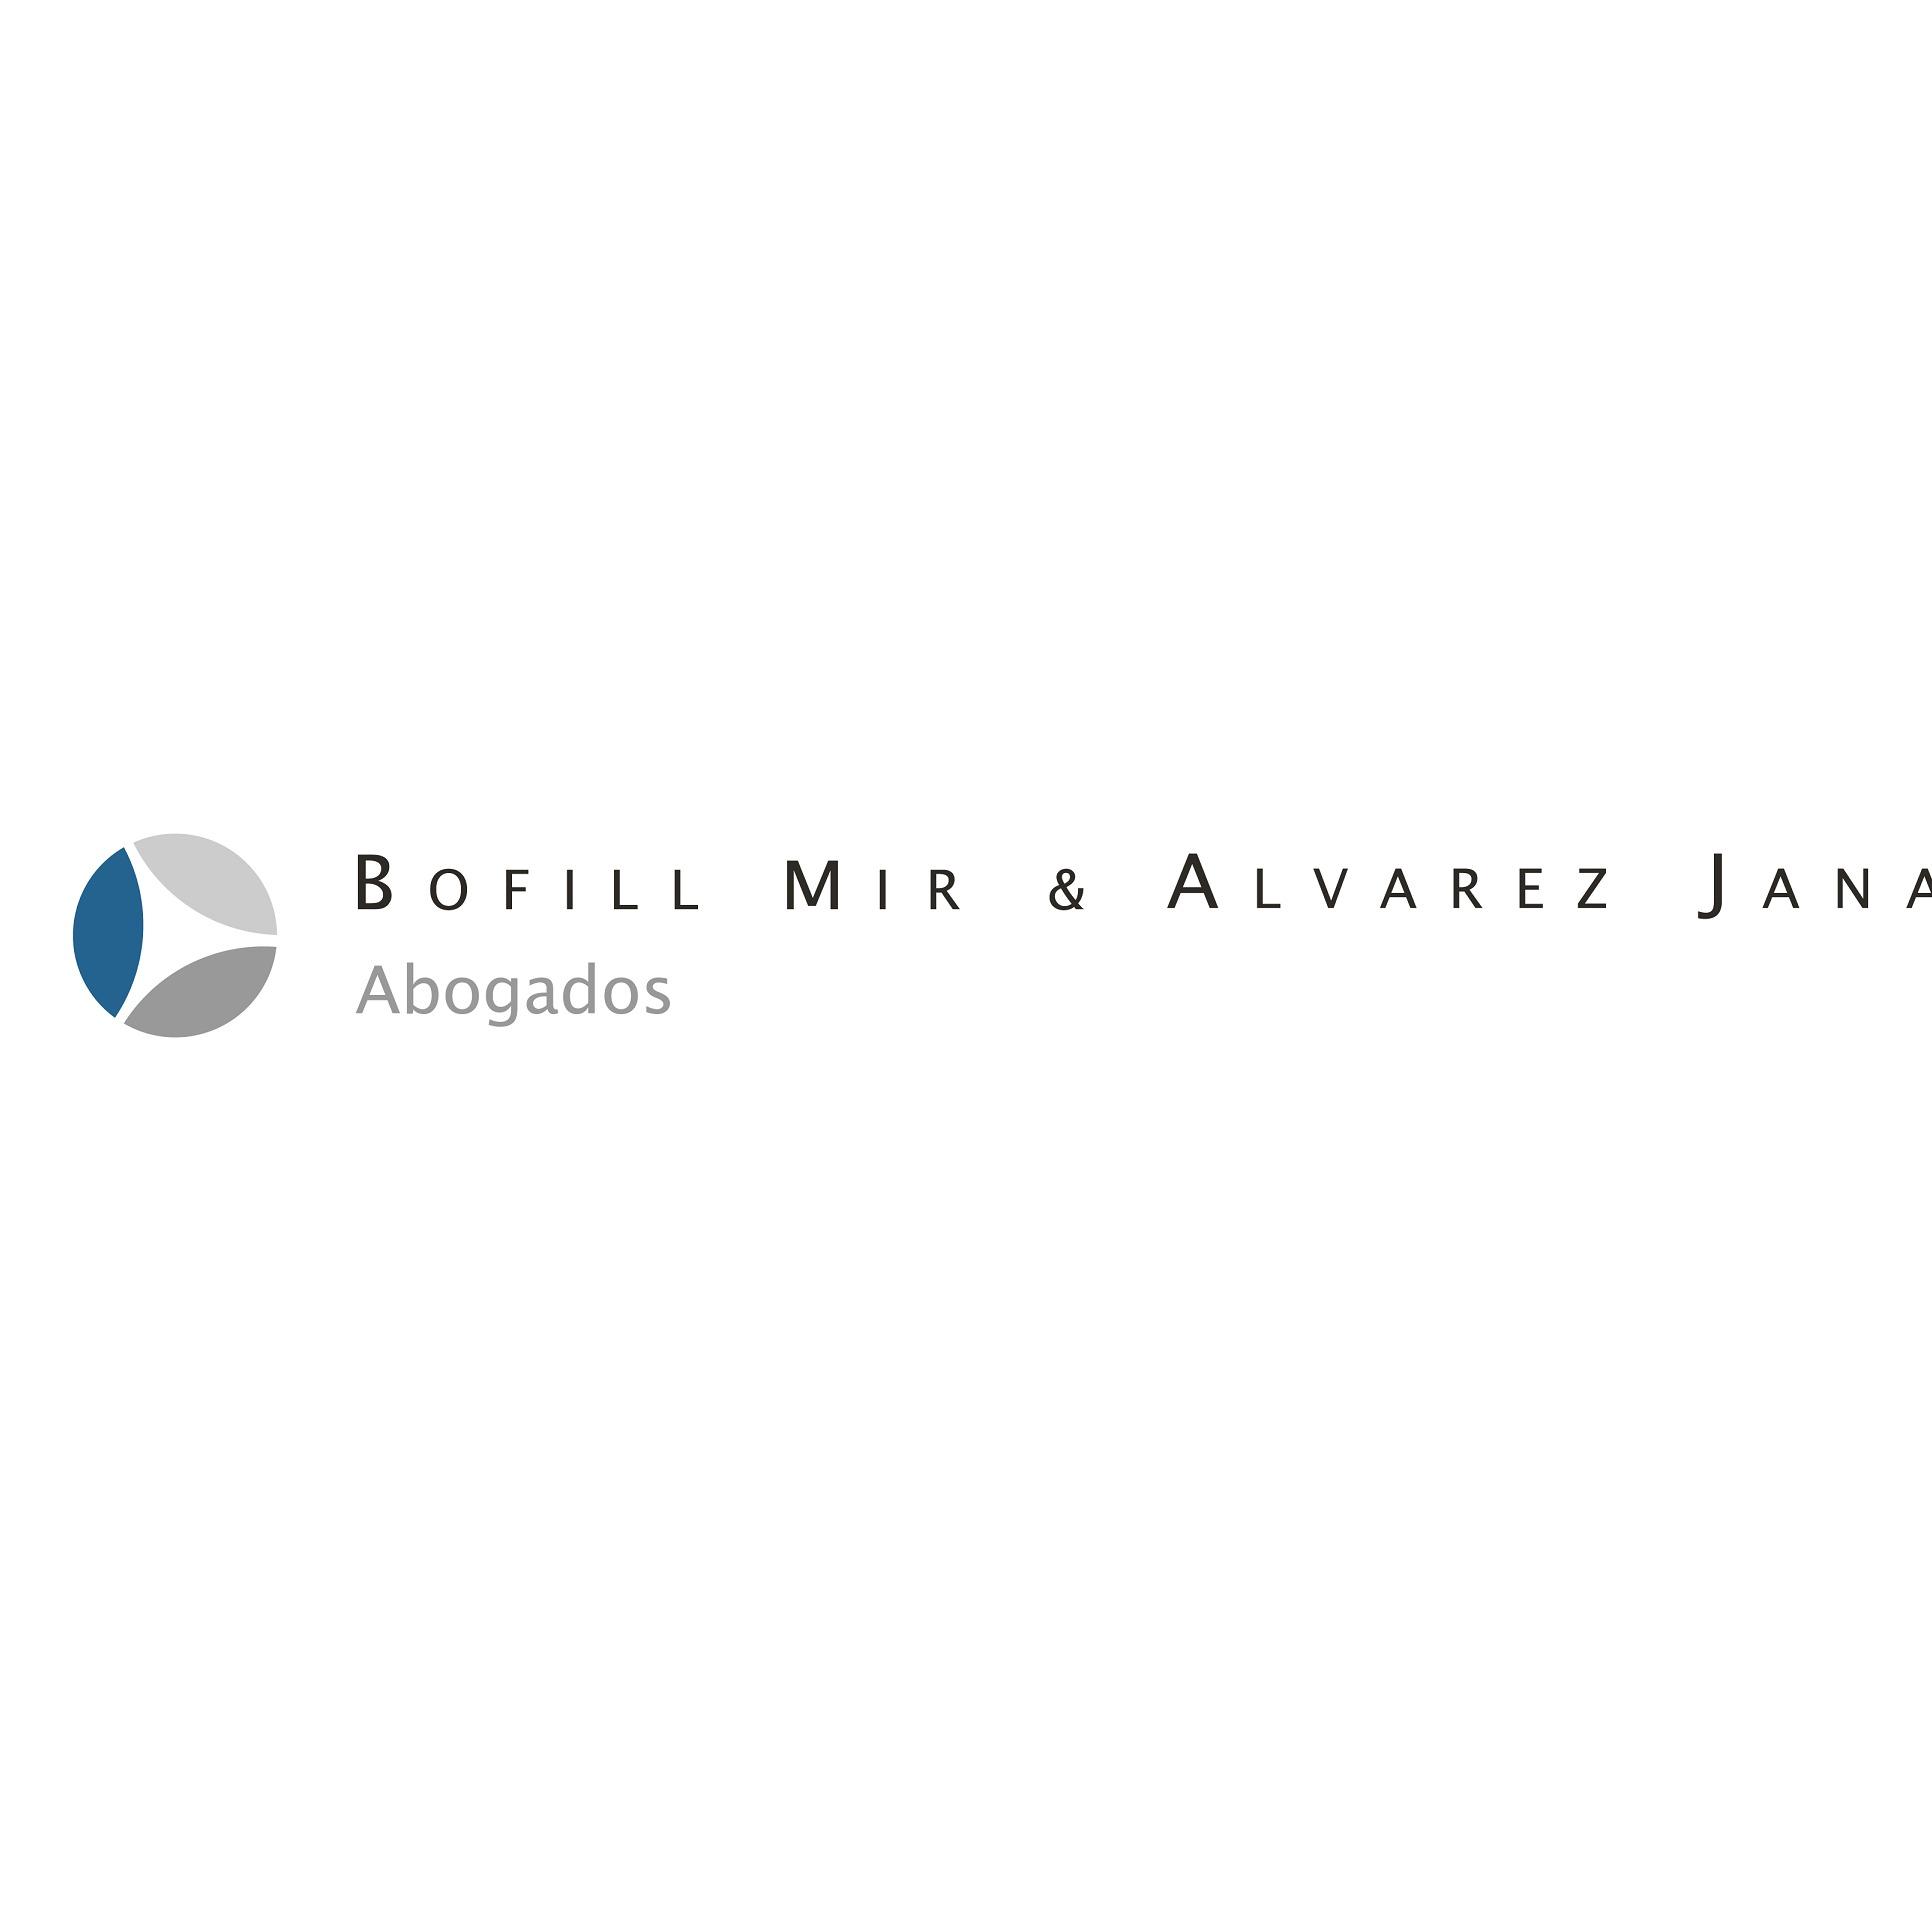 the Bofill Mir & Álvarez Jana Abogados logo.